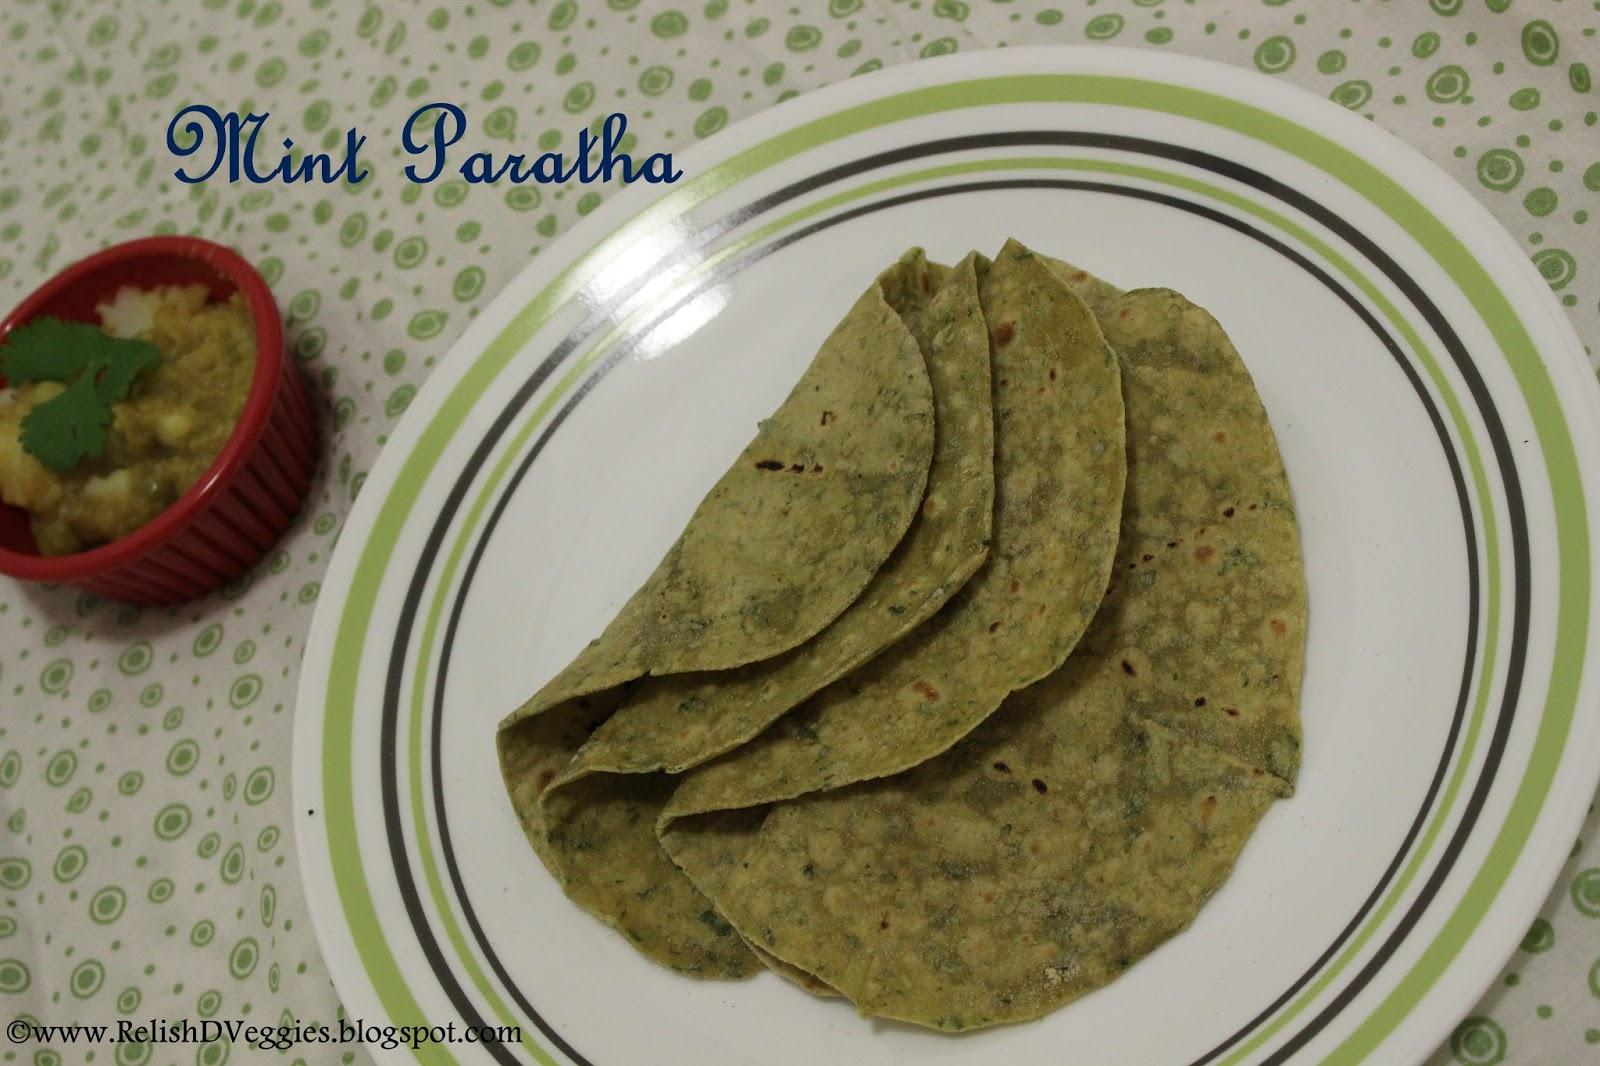 Relish the Veggies: Mint Paratha/ Pudhina Paratha